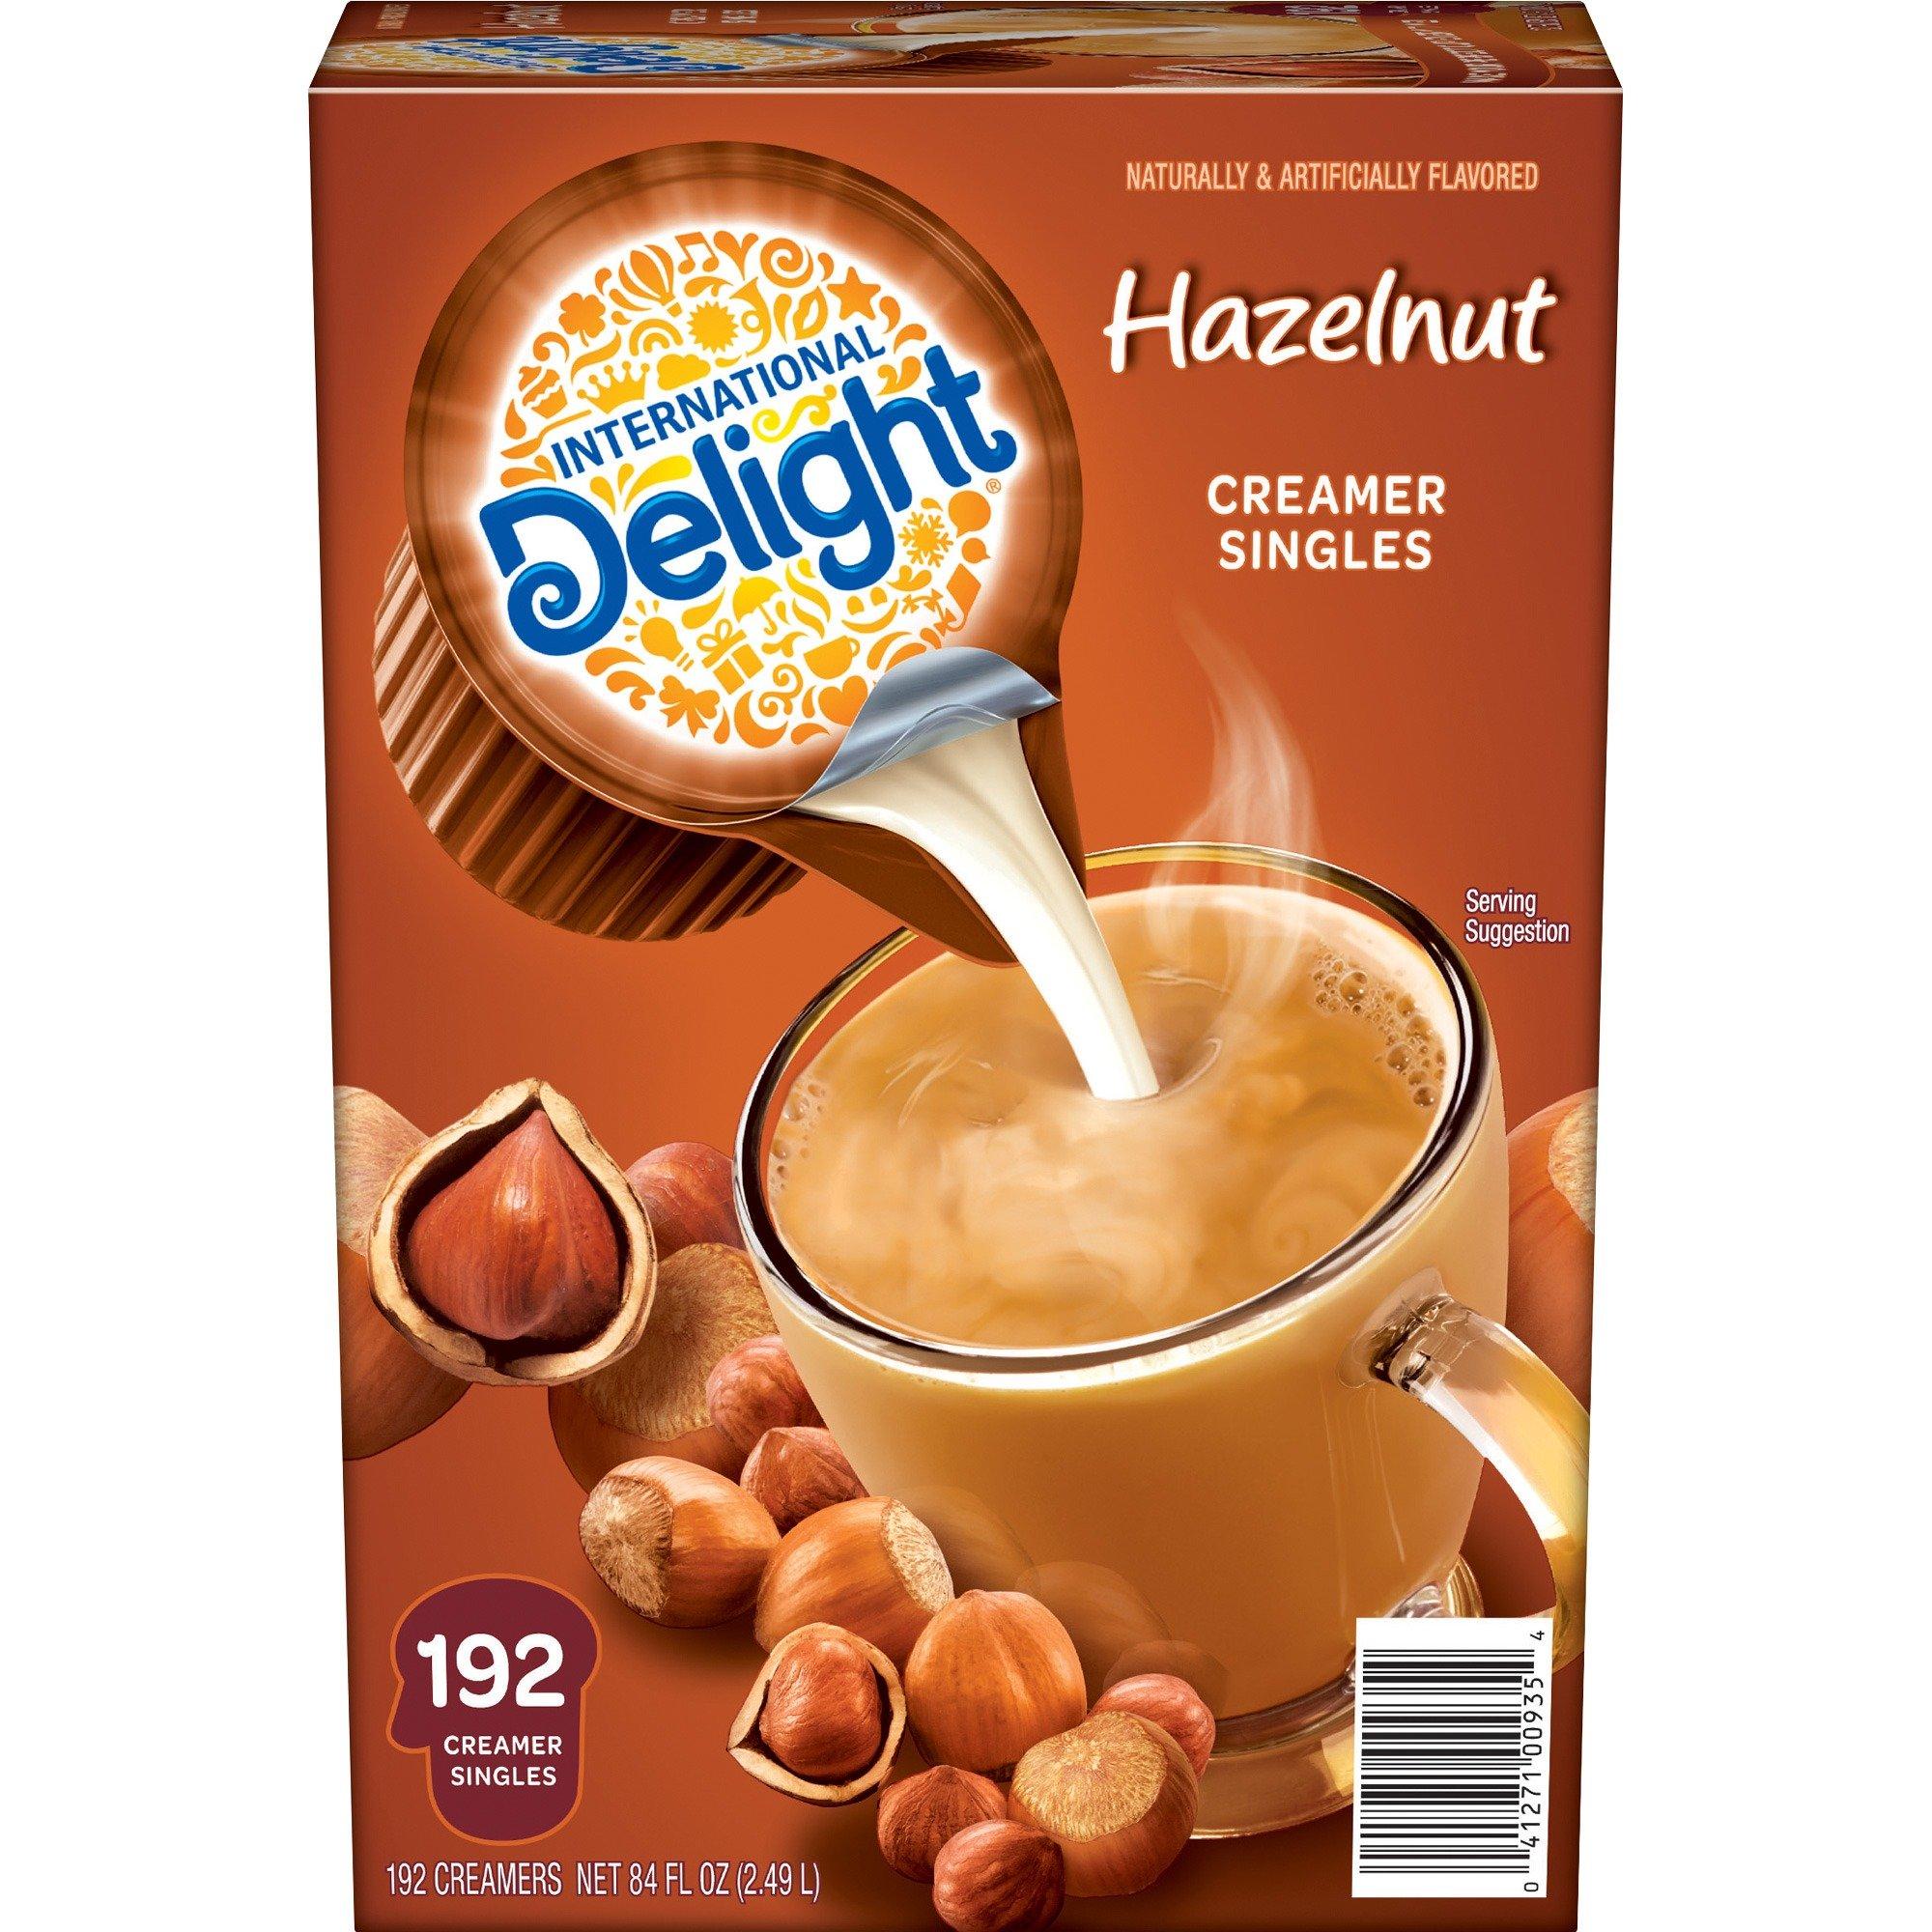 WhiteWave 100709 Liquid Coffee Creamer Intl Delight .5oz 192/CT Hazelnut by International Delight